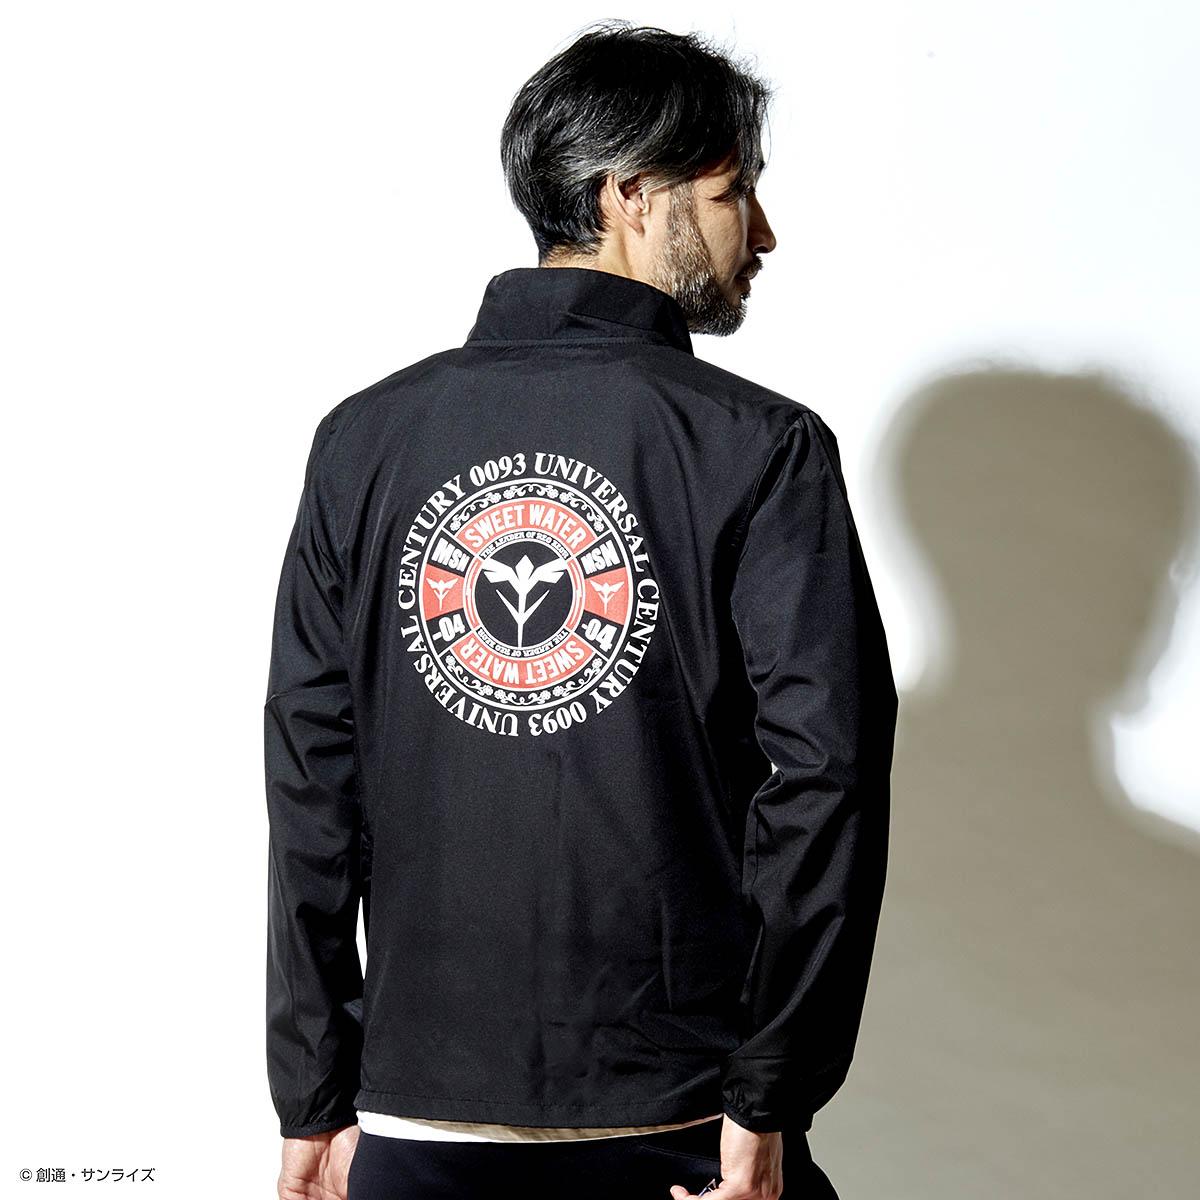 STRICT-G『機動戦士ガンダム 逆襲のシャア』リップストップジャケット ネオ・ジオン柄